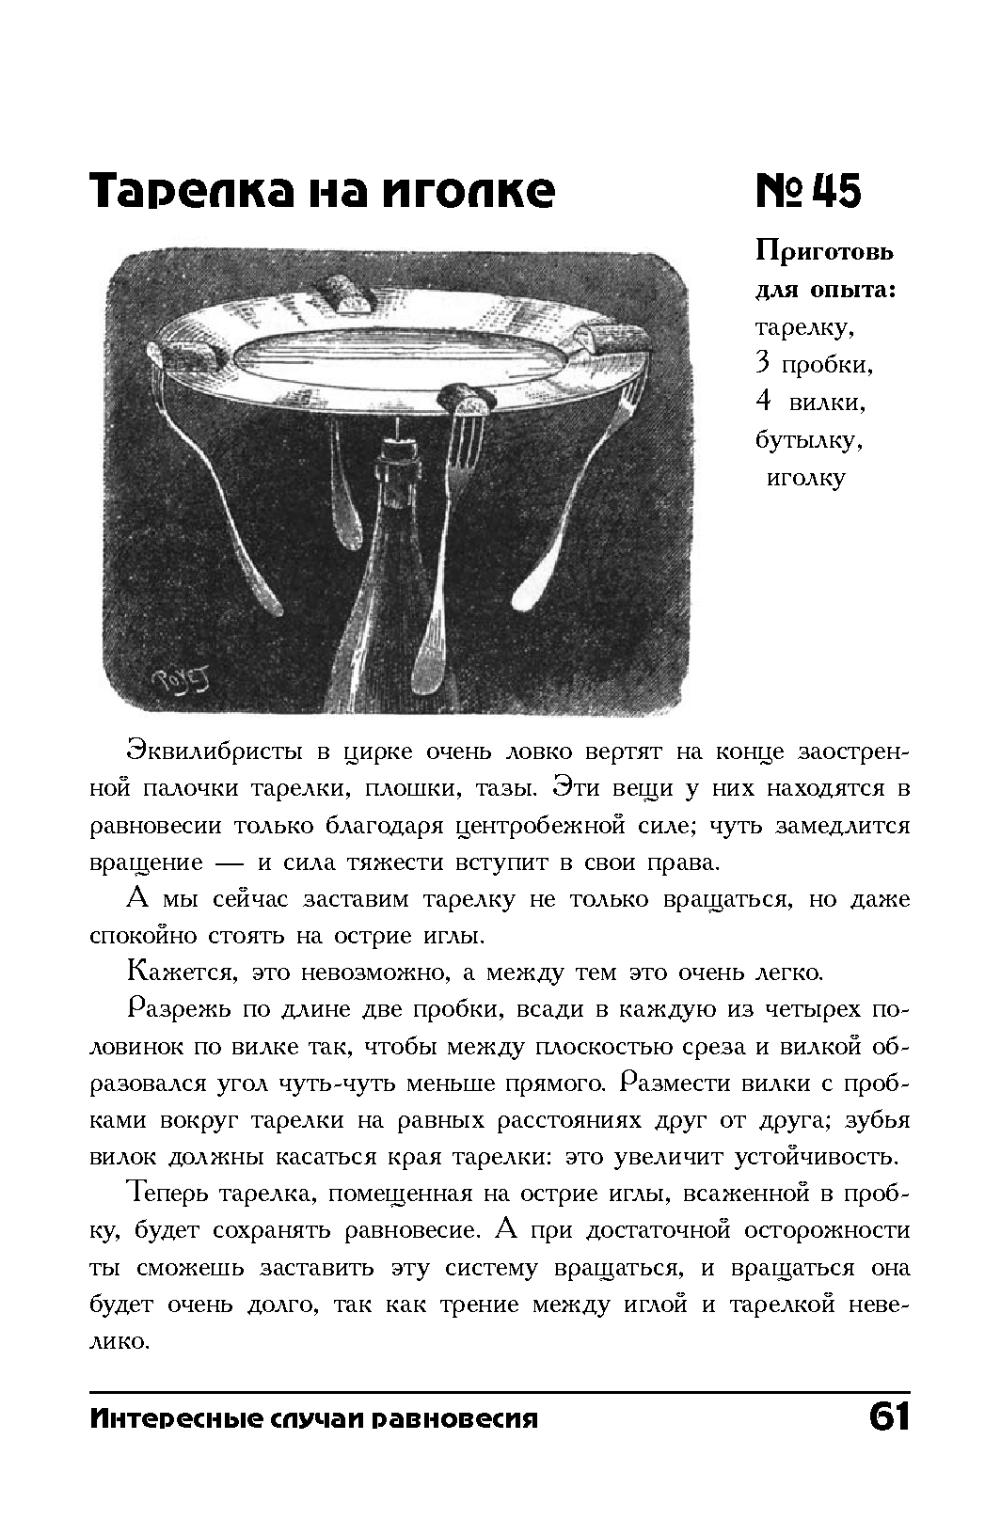 http://i6.imageban.ru/out/2013/10/28/247a195ab542819579cddf46757017b0.jpg